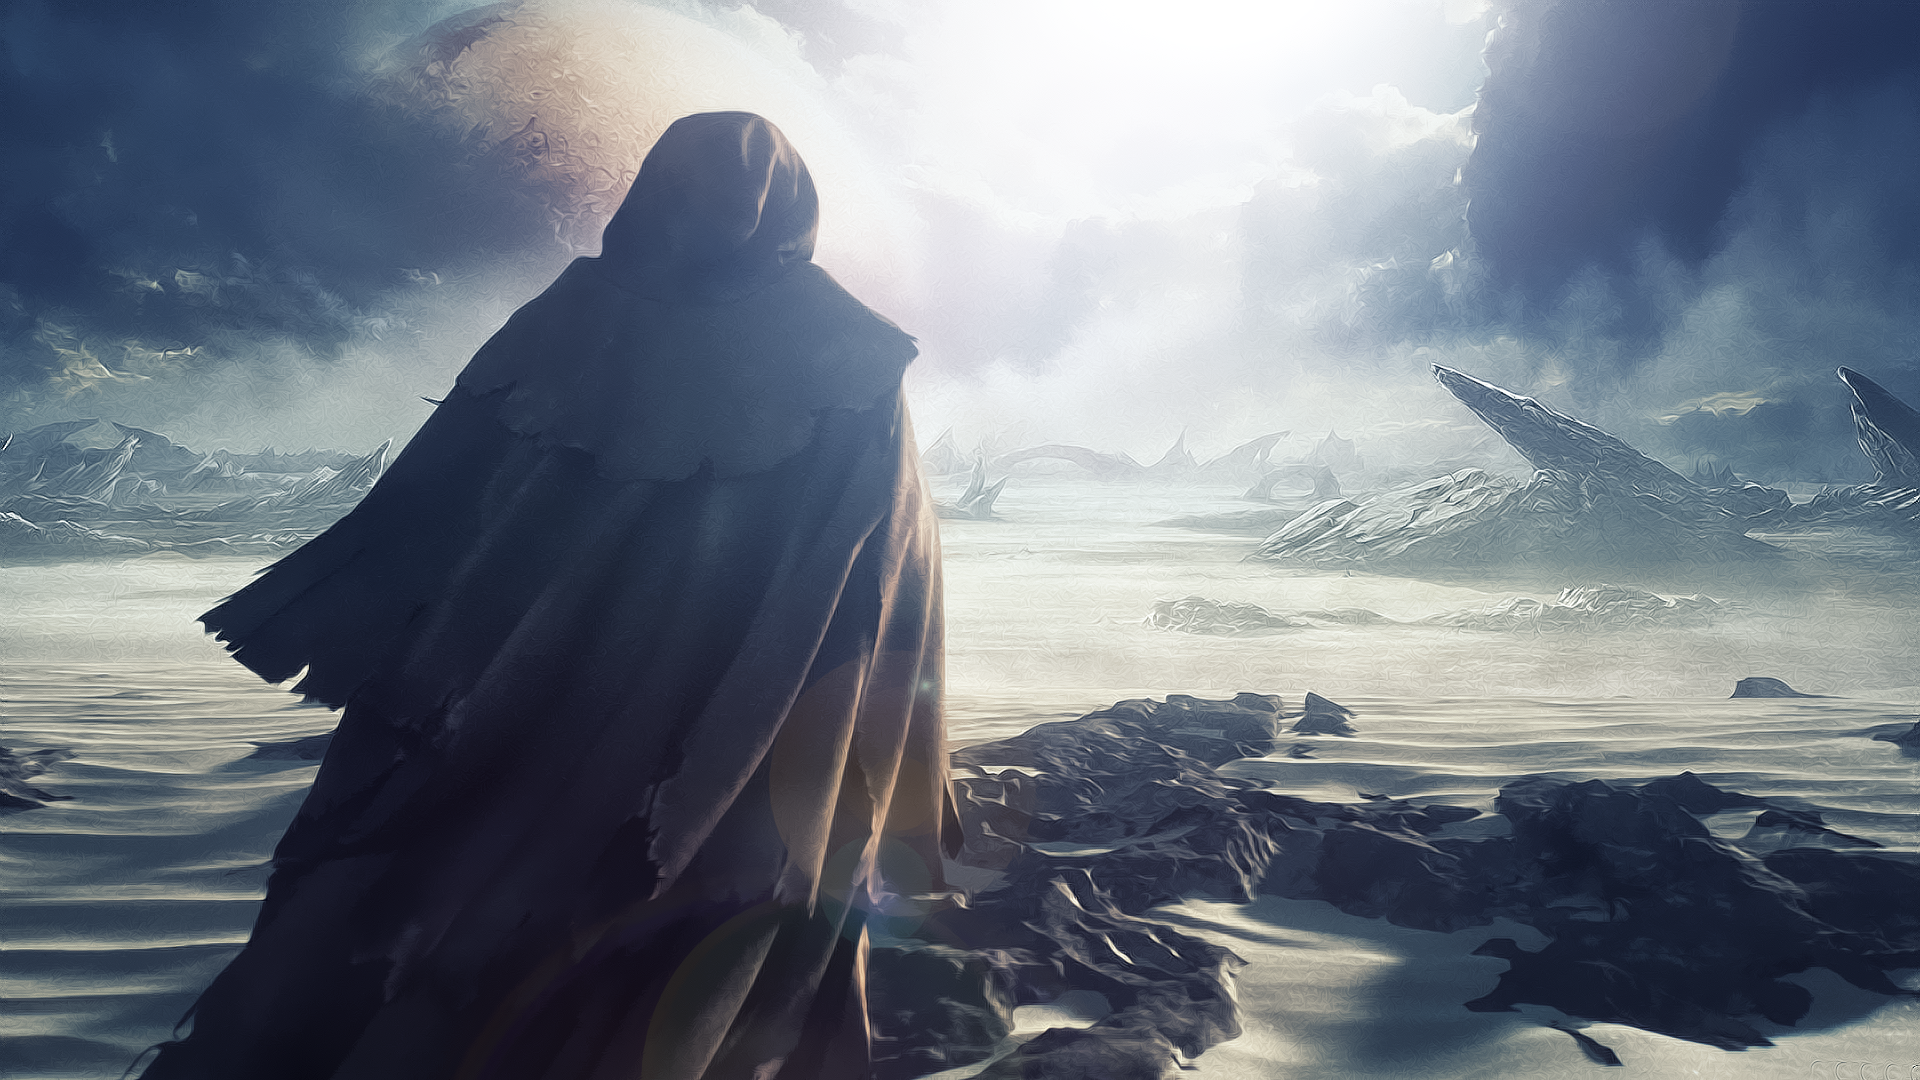 Halo 5 Wallpaper by KingAirsoftSniper 1920x1080